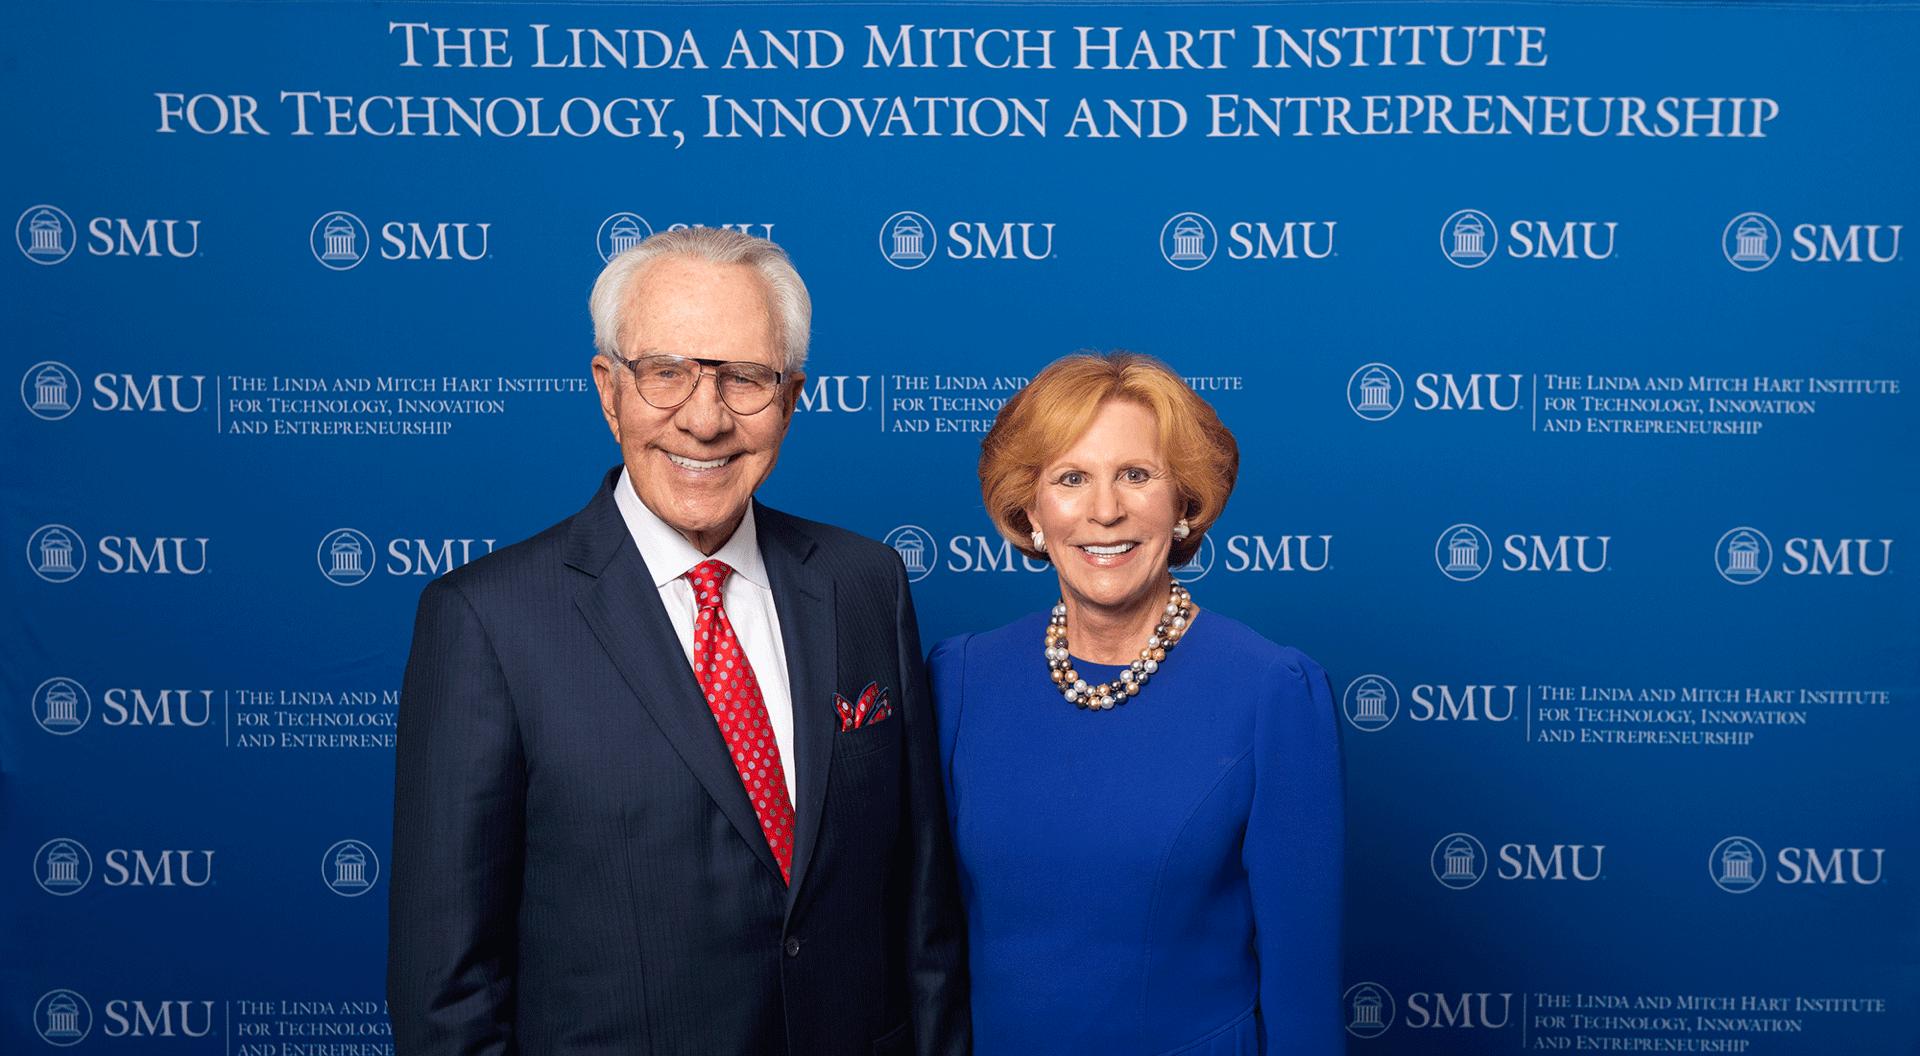 Mitch and Linda Hart